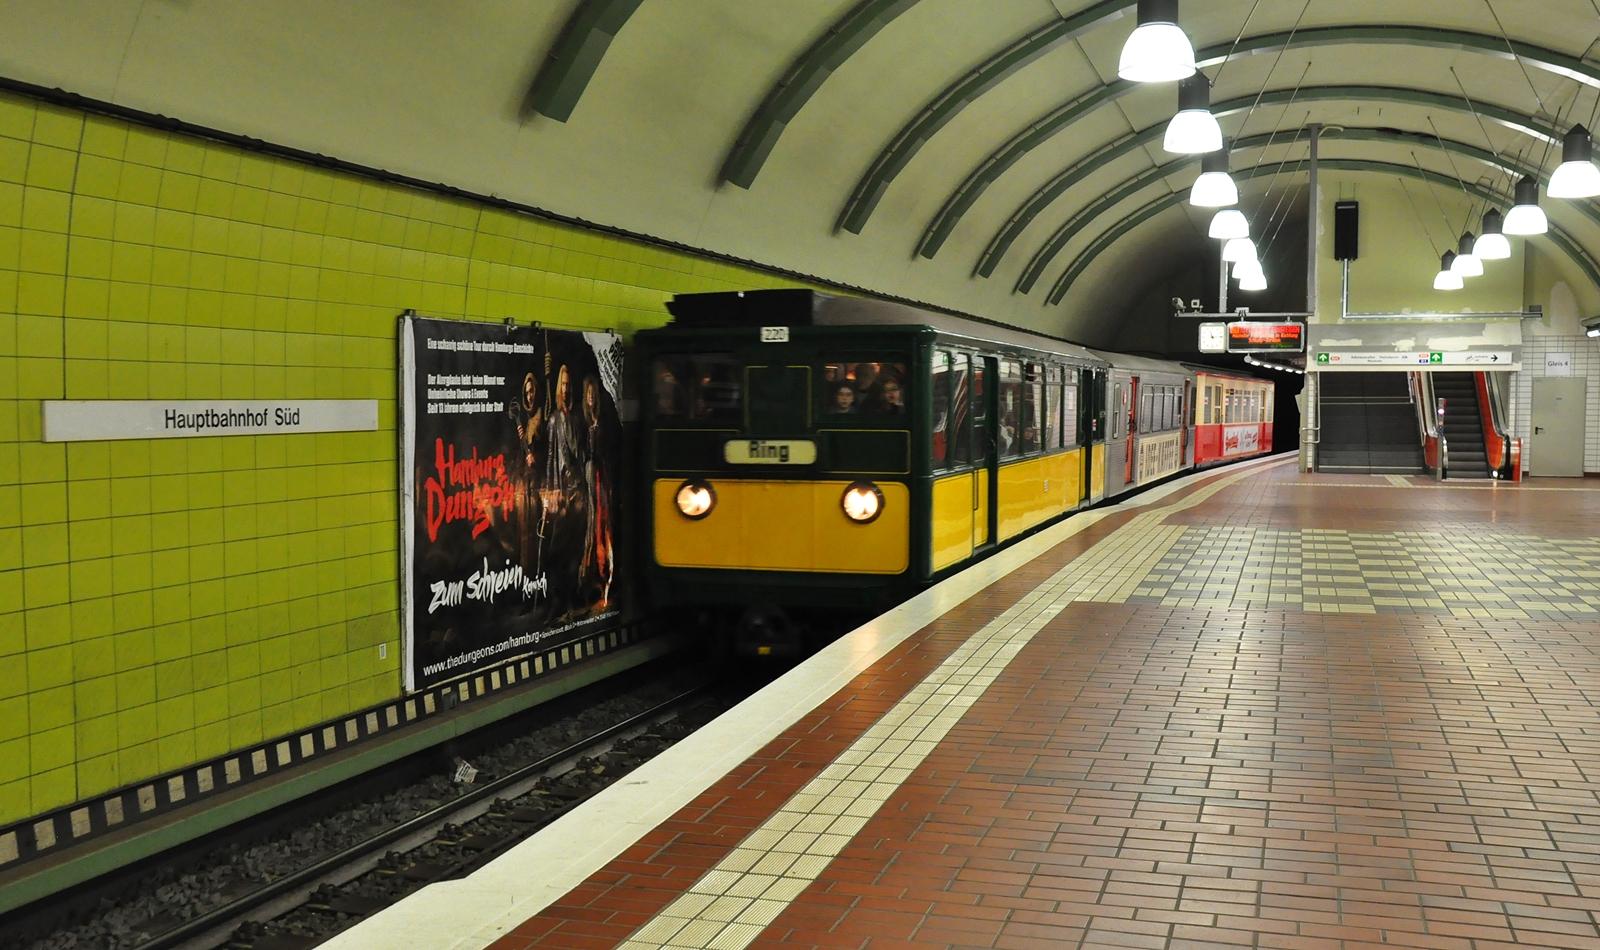 T / TU-Wagen Zug am Hamburger Hbf